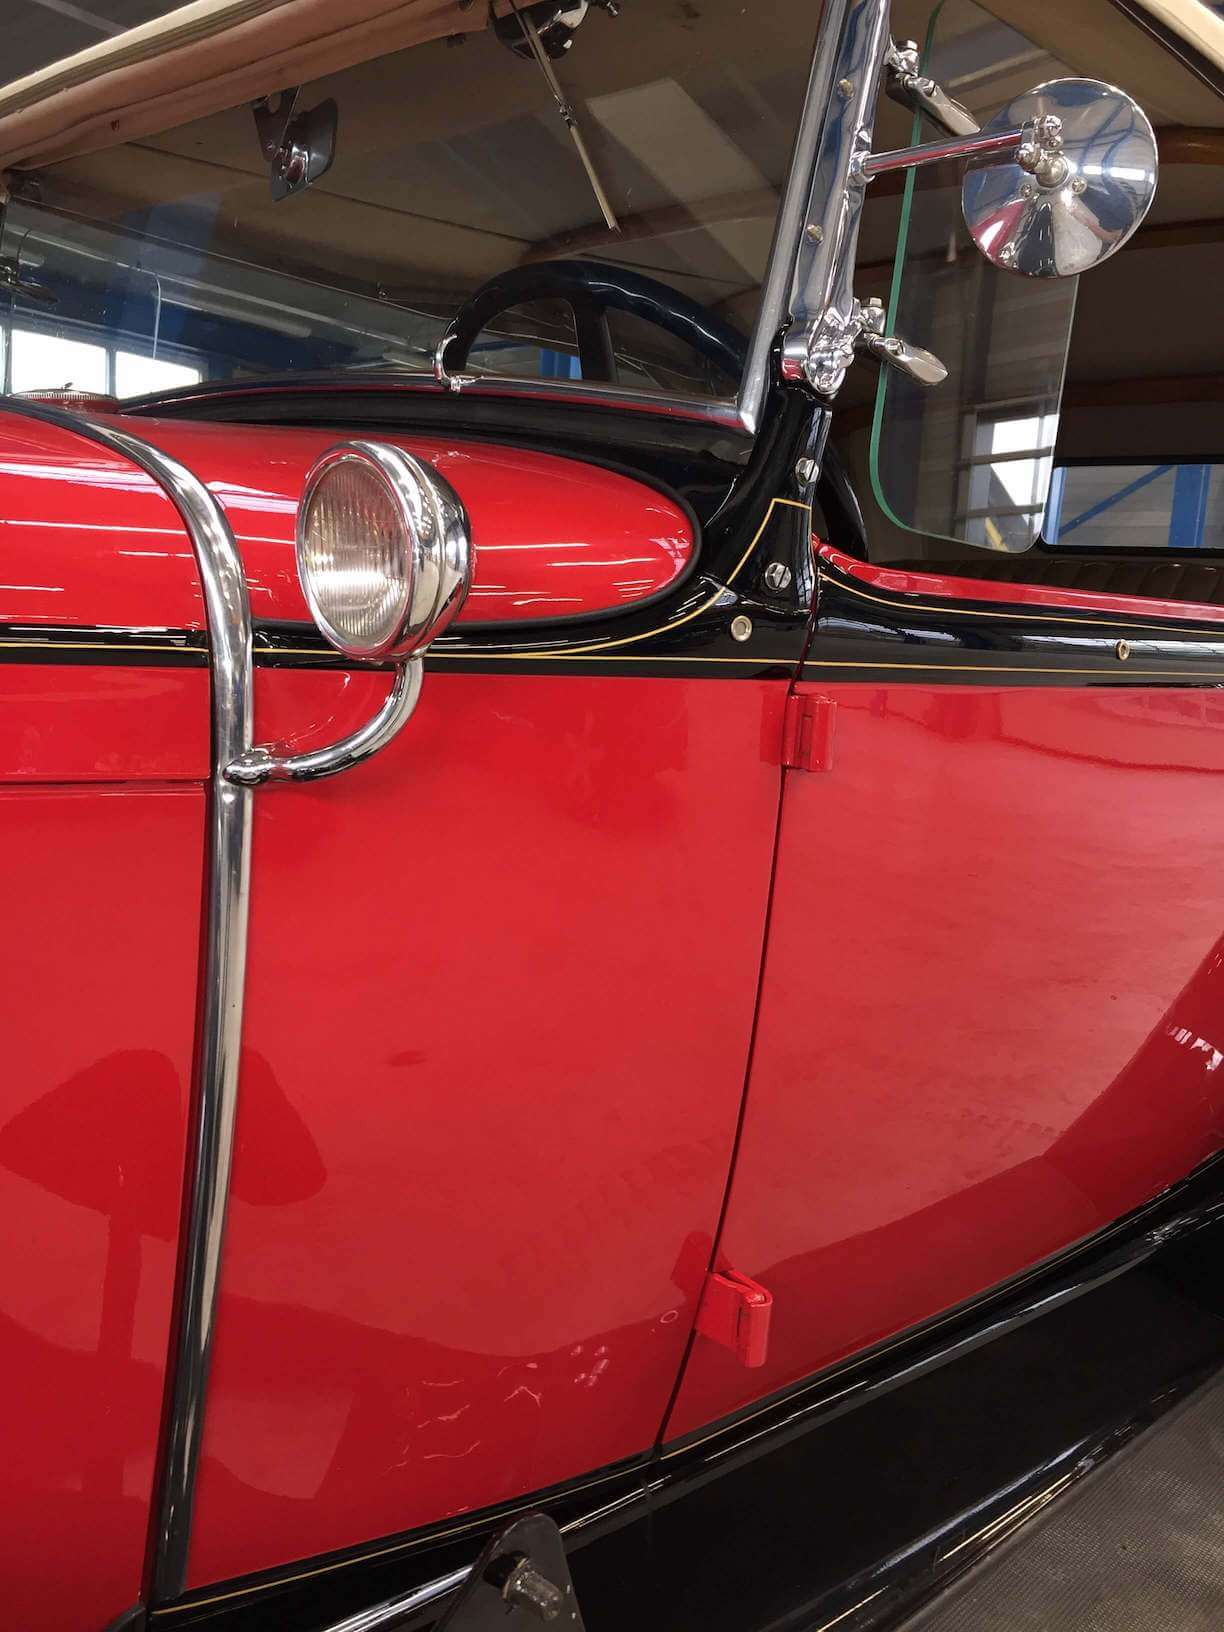 pinstriping Ford model A oldtimer